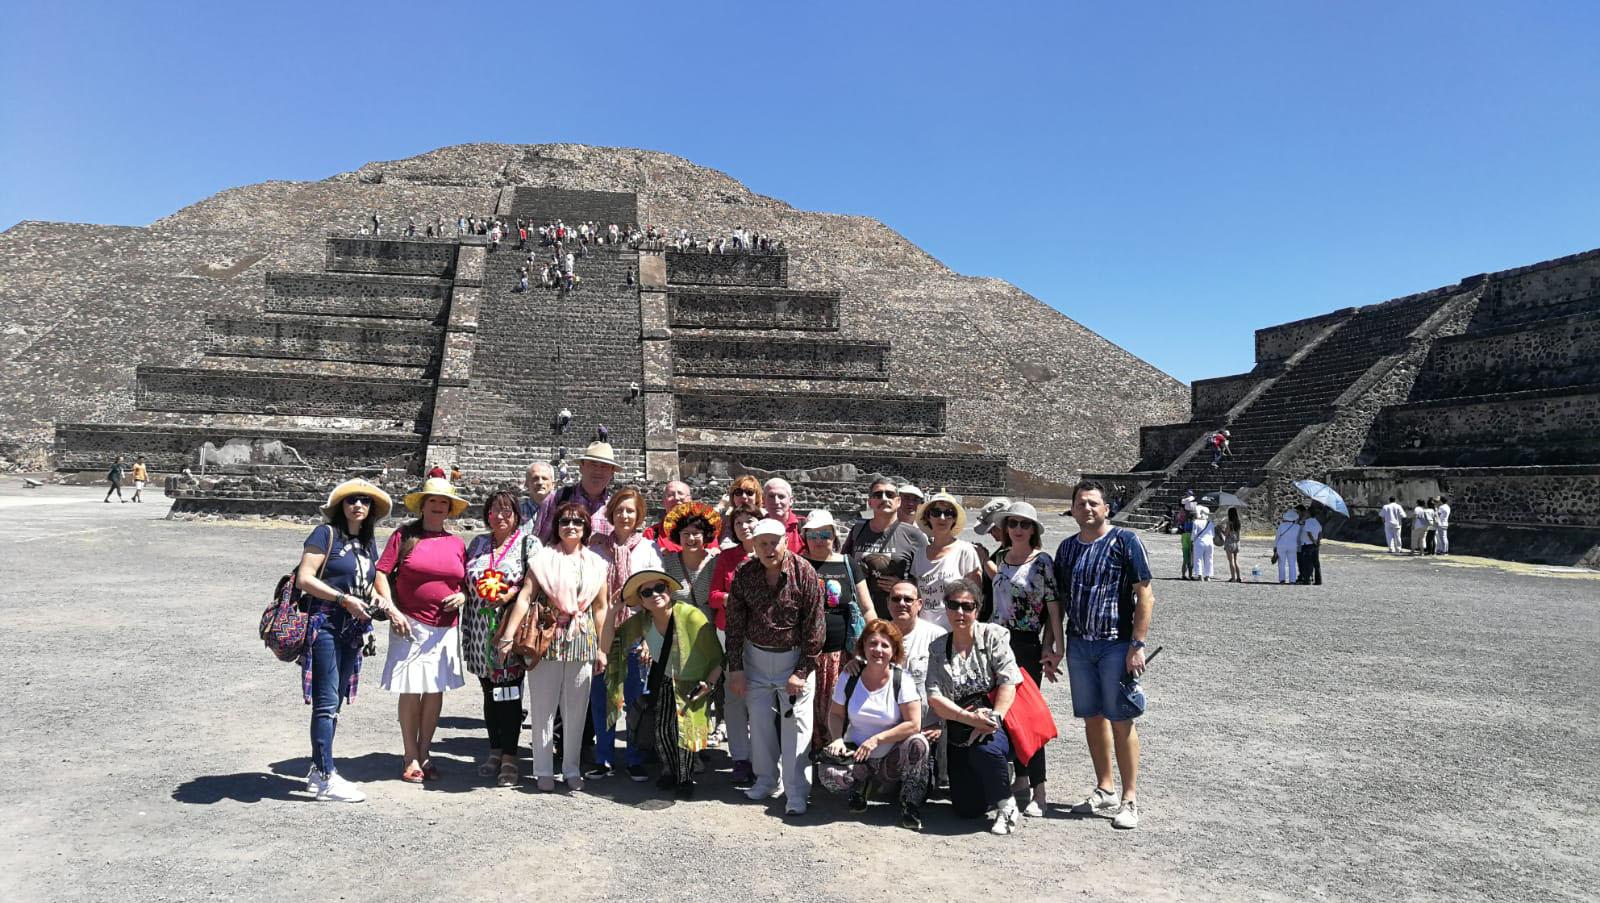 Mexic Teotihuacan Mar 2018